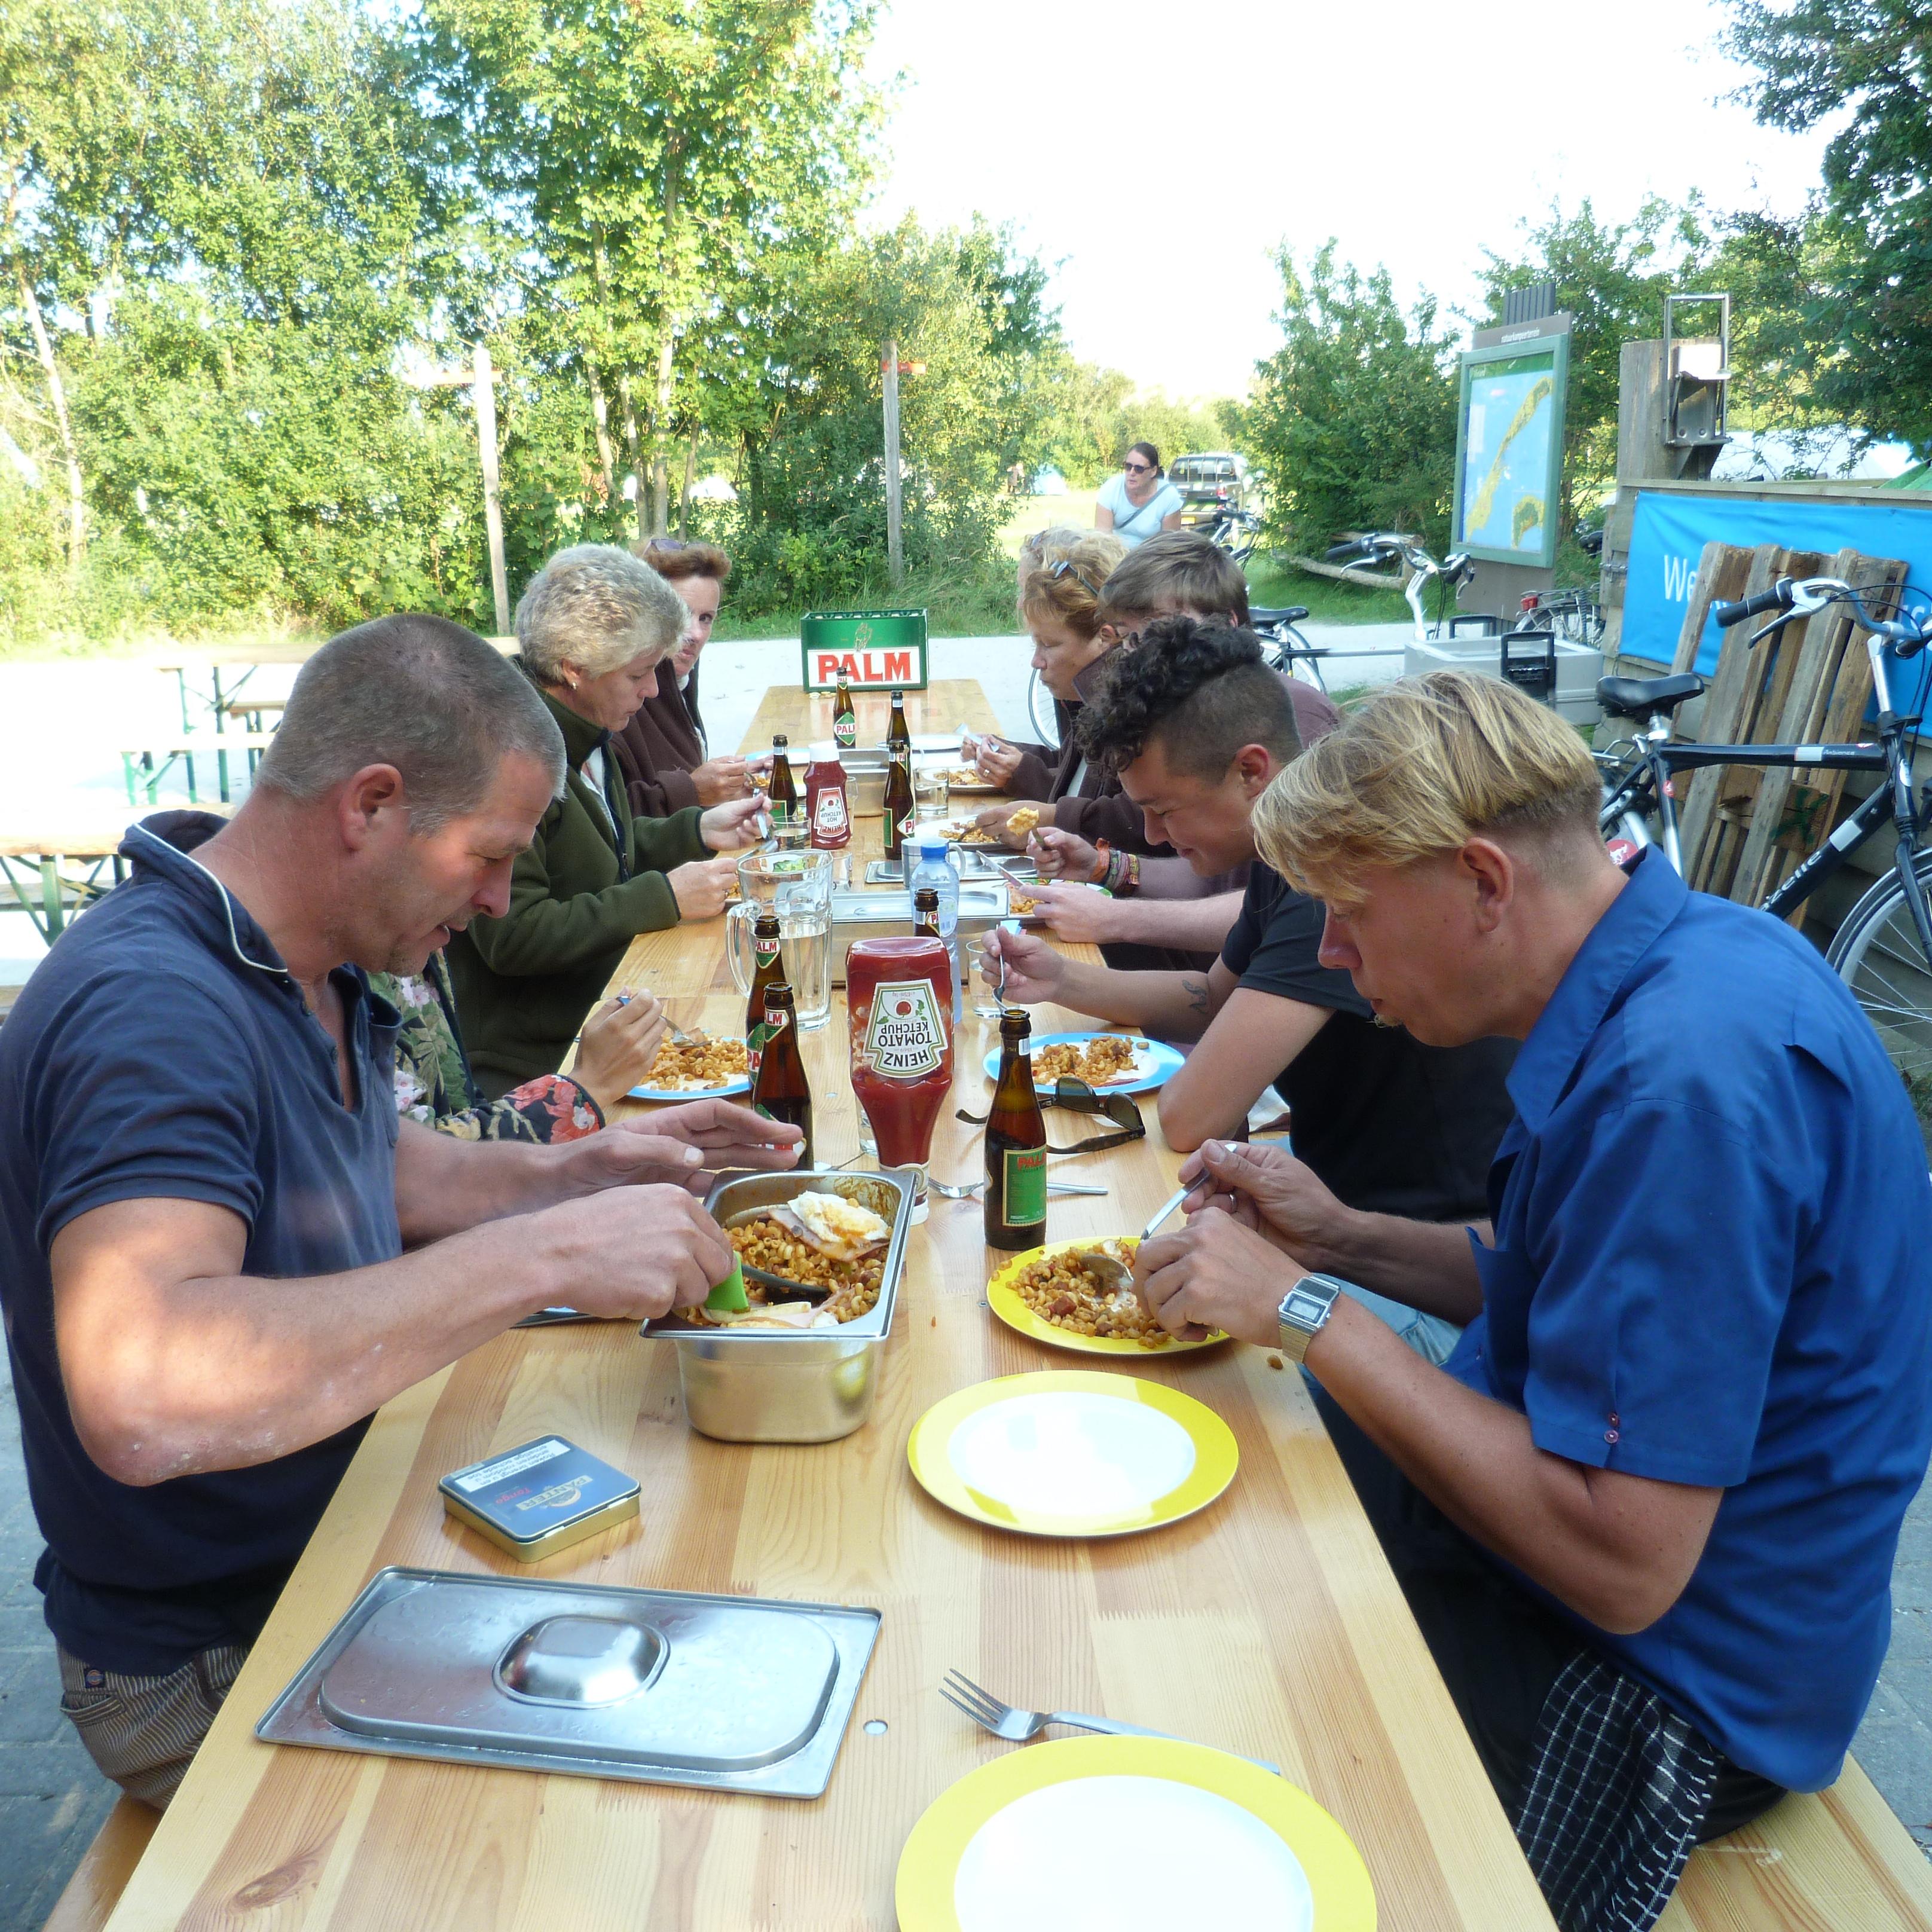 Even samen eten; v.l.n.r. Frits Kers (smaakvolvo) Beheerder Lange Paal Frederika Breijer, vrijwilliger Heleen Verspuy, Beheerder Vlieland Sonja, zoon Ruben ( net niet te zien) Steef (Vaste Gasten) en Guido (Smaakvolvo)